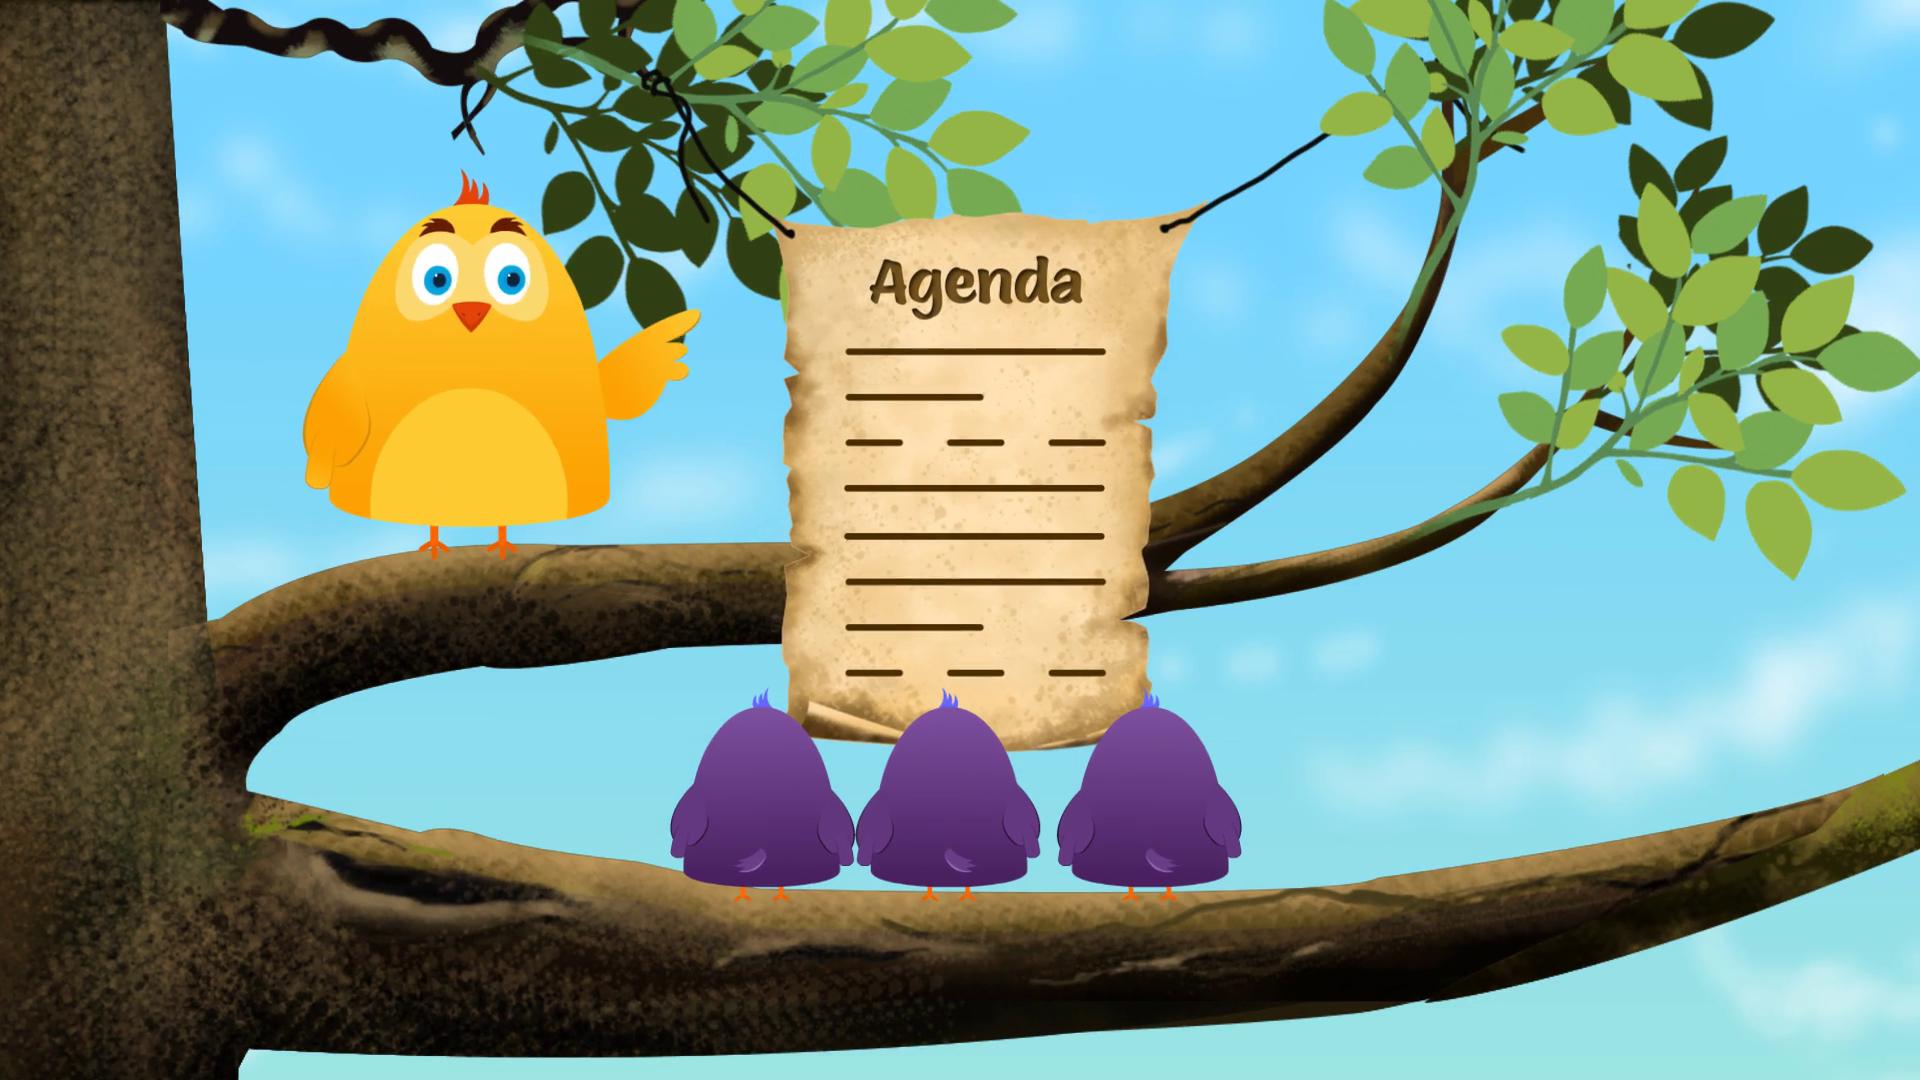 Defining the Right Agenda